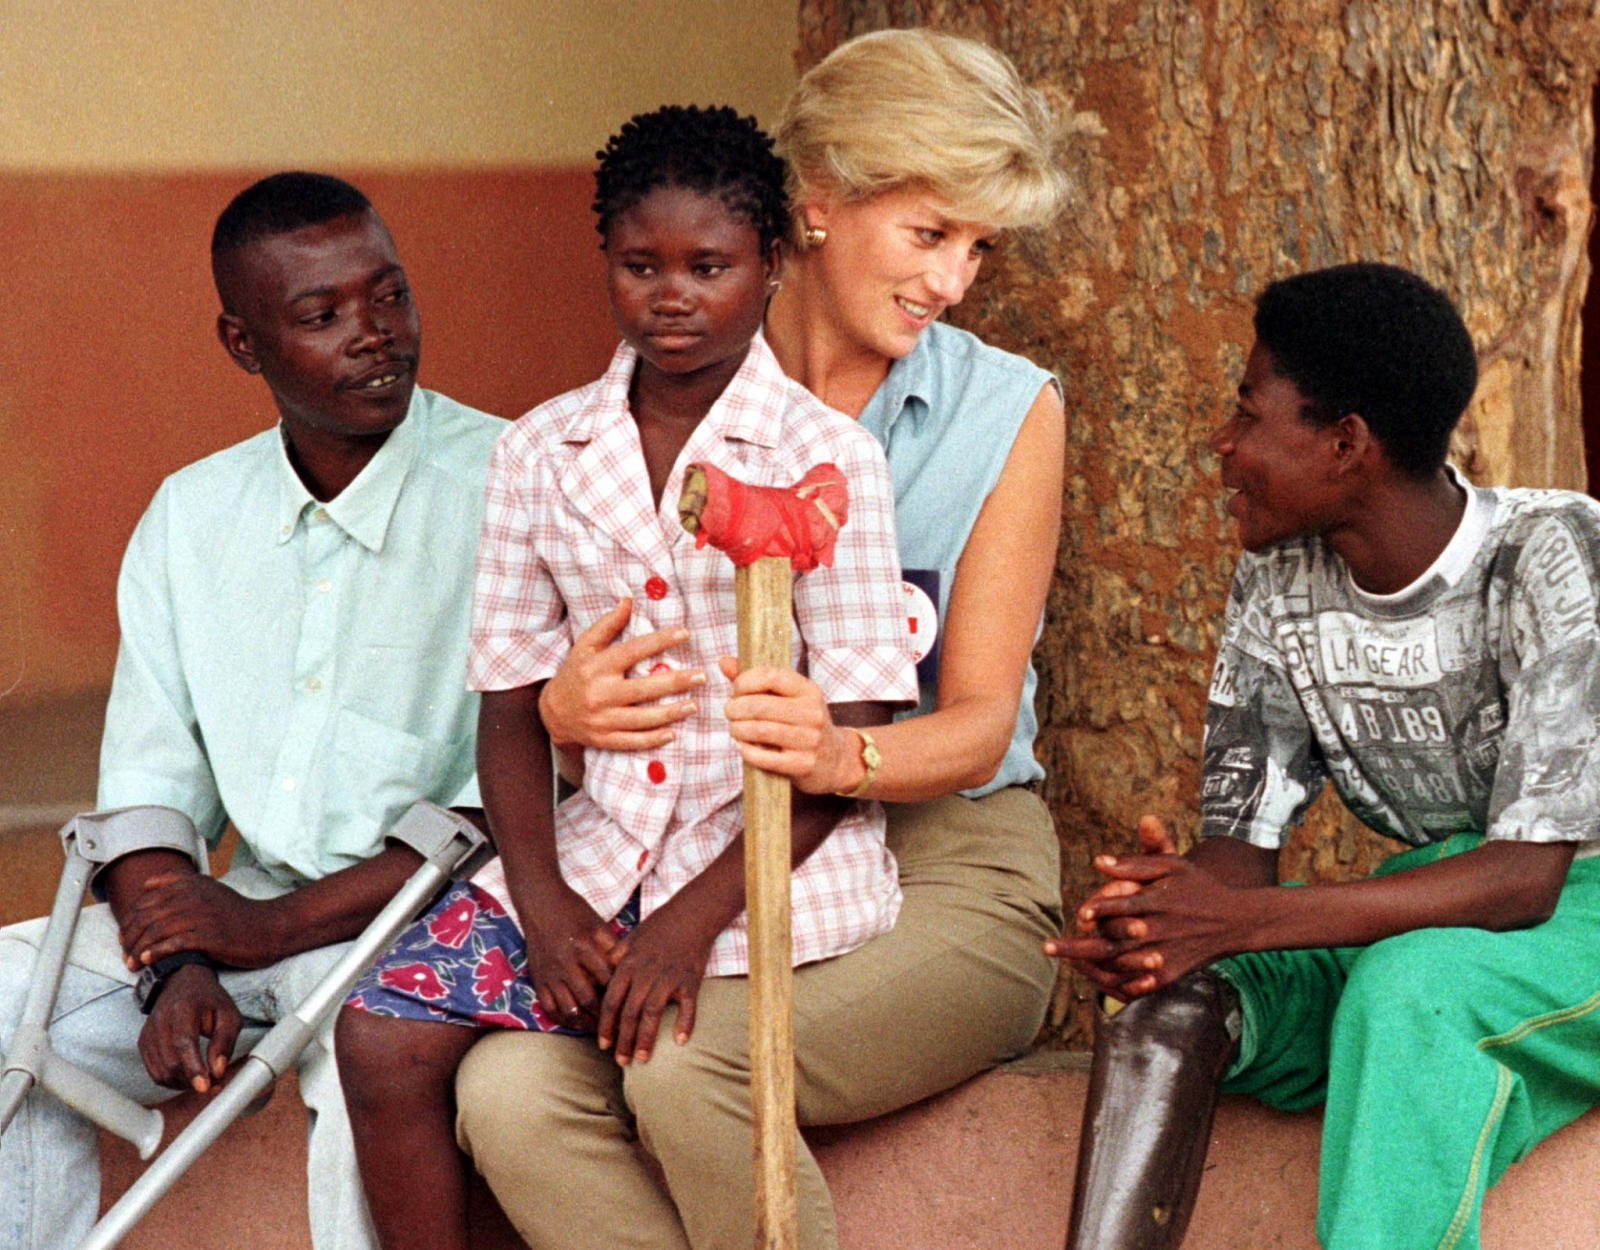 Princess Diana Death Anniversary 2015 Top 10 Heart Touching